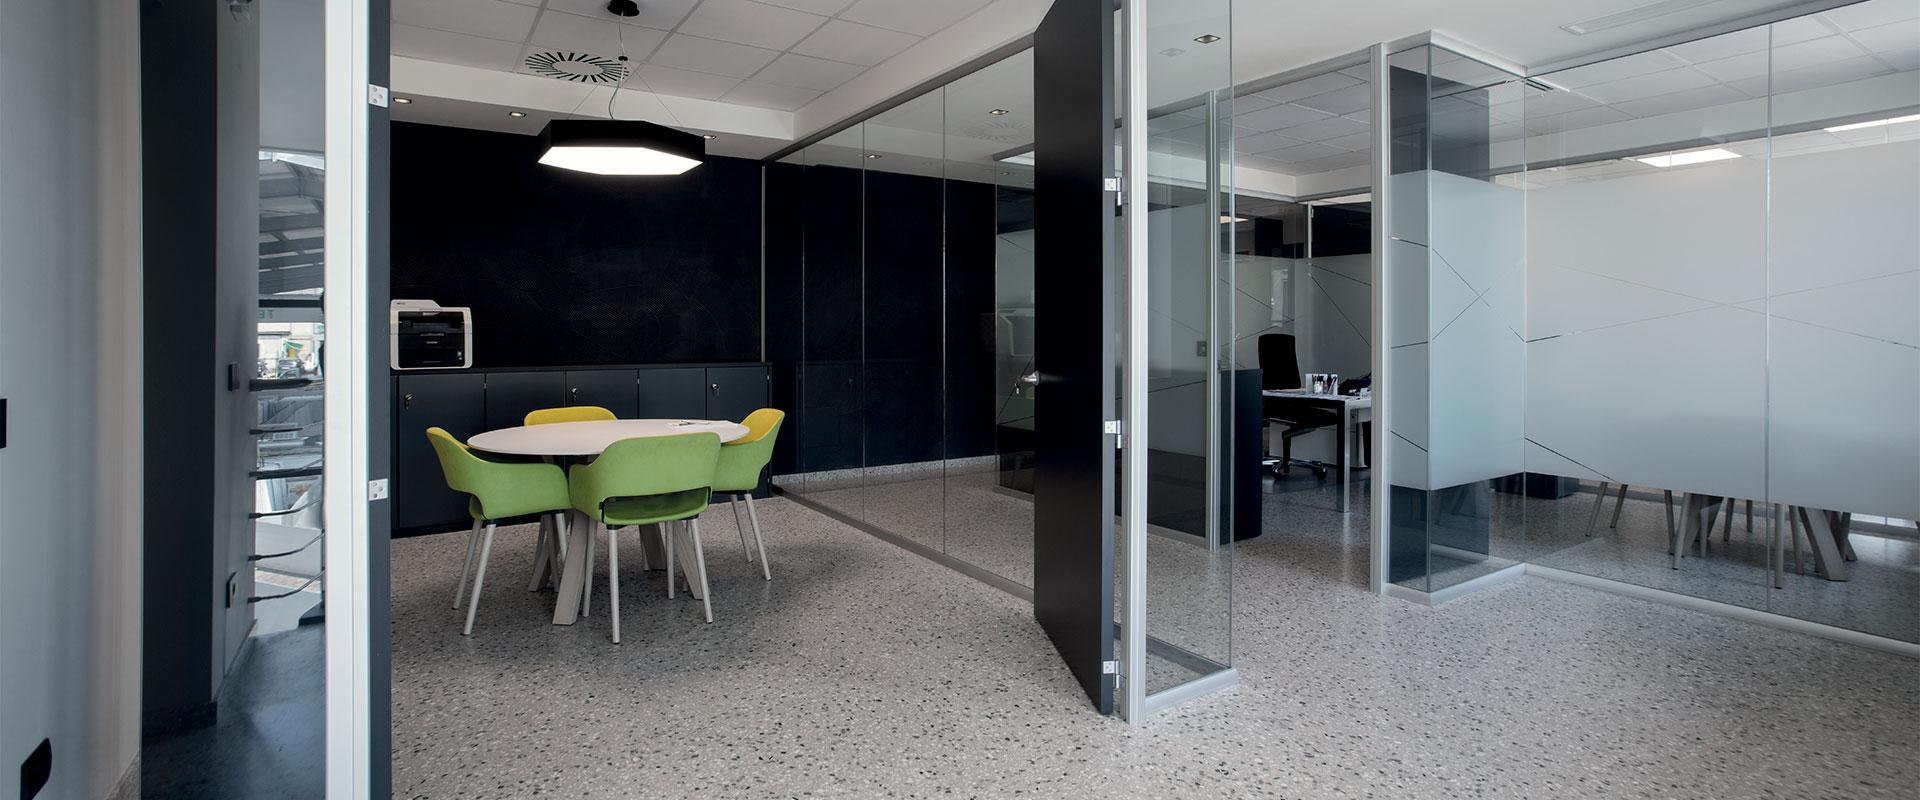 agglotech-offices---verona-italy---custom-REG-3594---centri-direzionali-04---OK